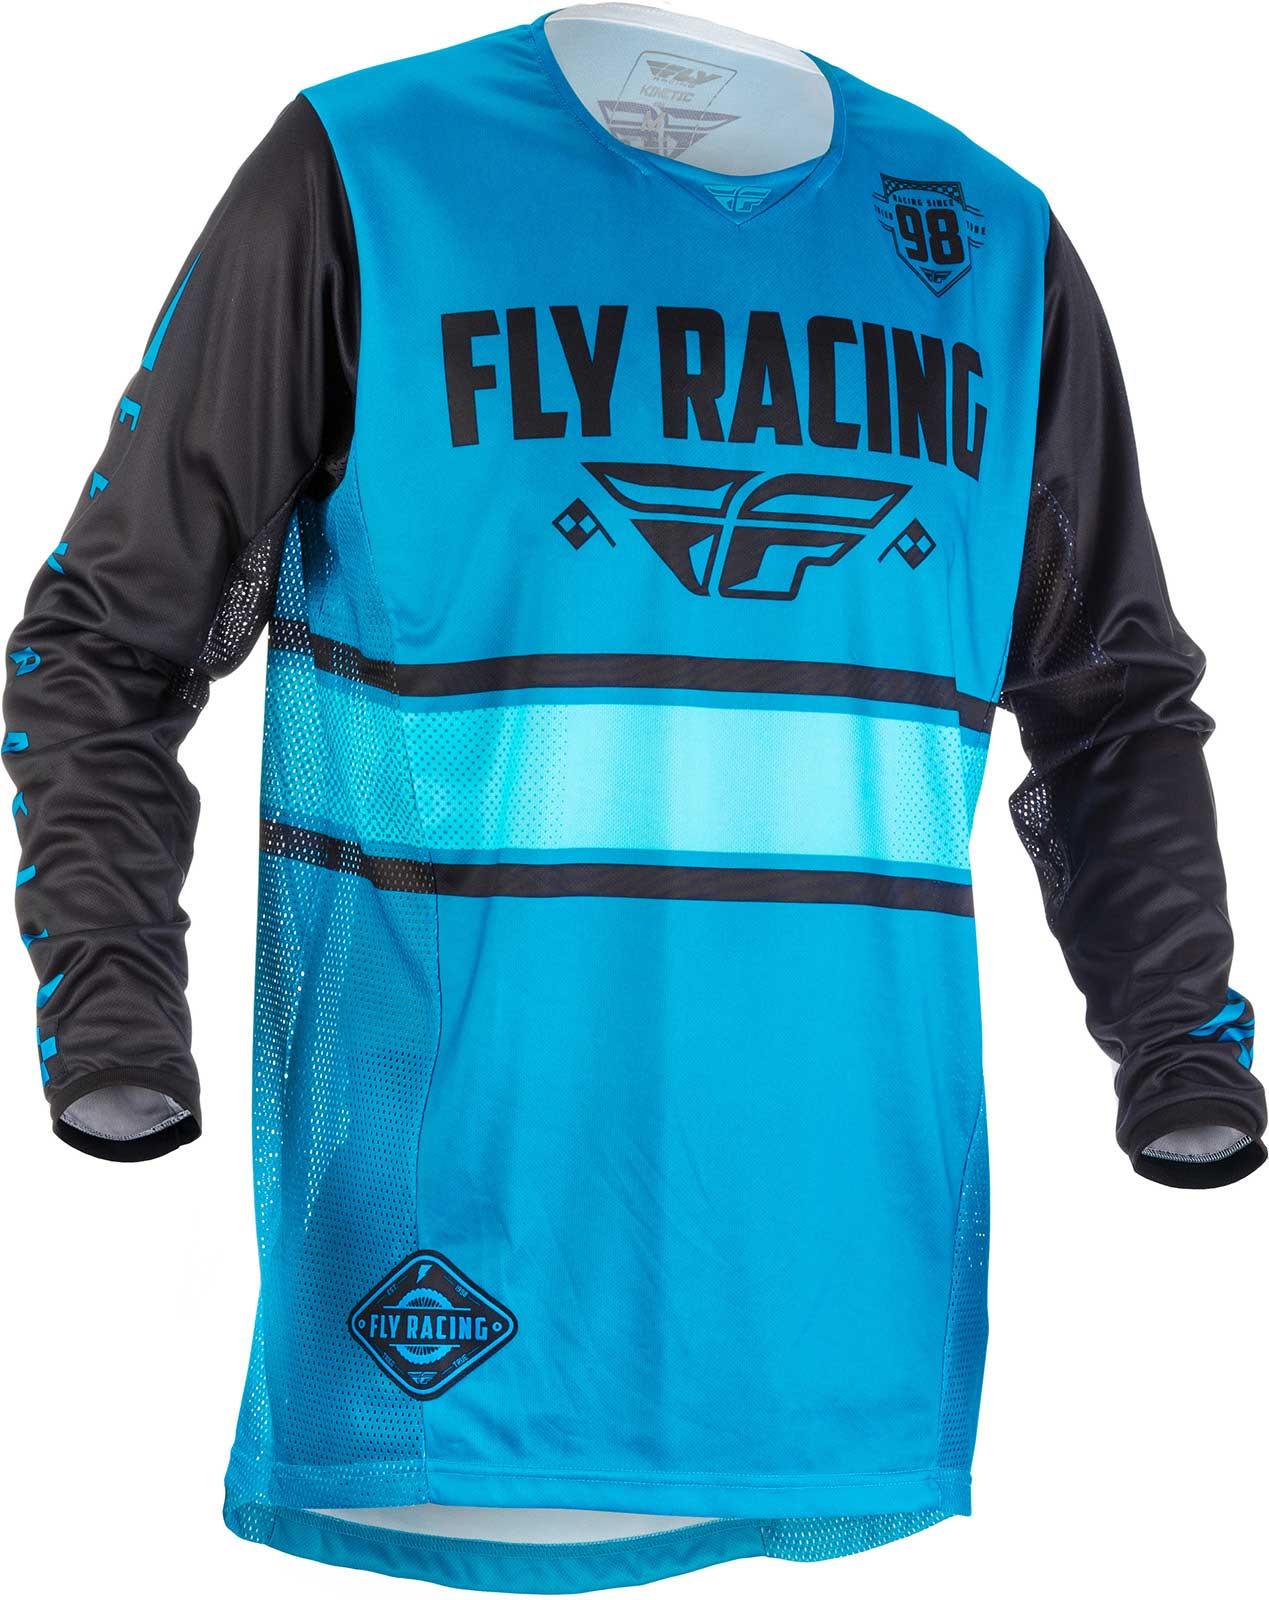 Motocross Dirtbike Offroad 2018 Fly Racing Kinetic Era Jersey